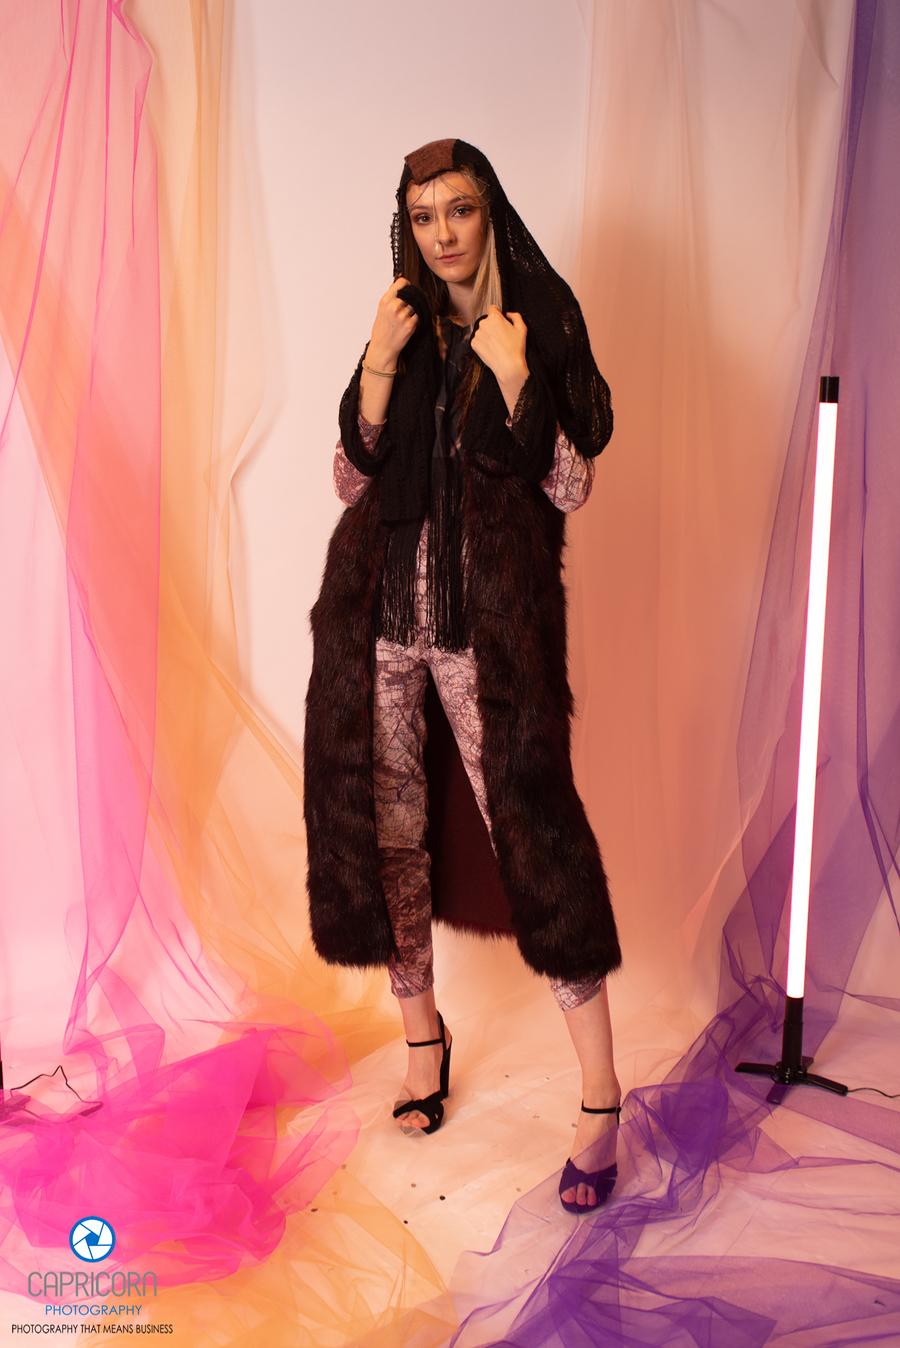 Model Laura Aimee / Uploaded 15th January 2021 @ 10:03 PM